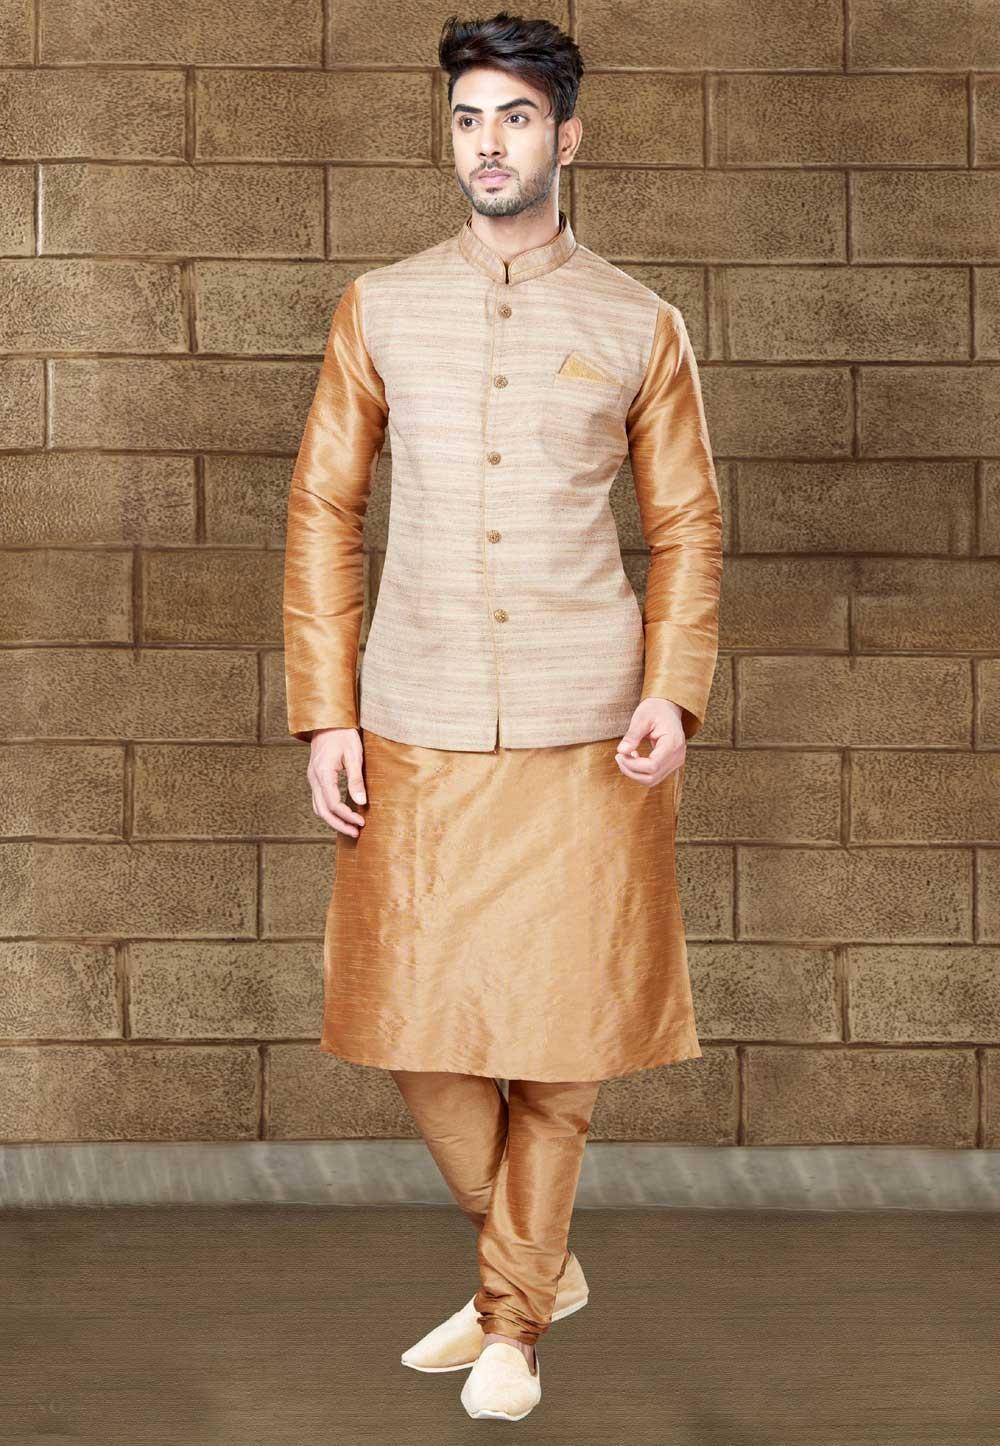 Golden Color Readymade Kurta Pajama With Jacket